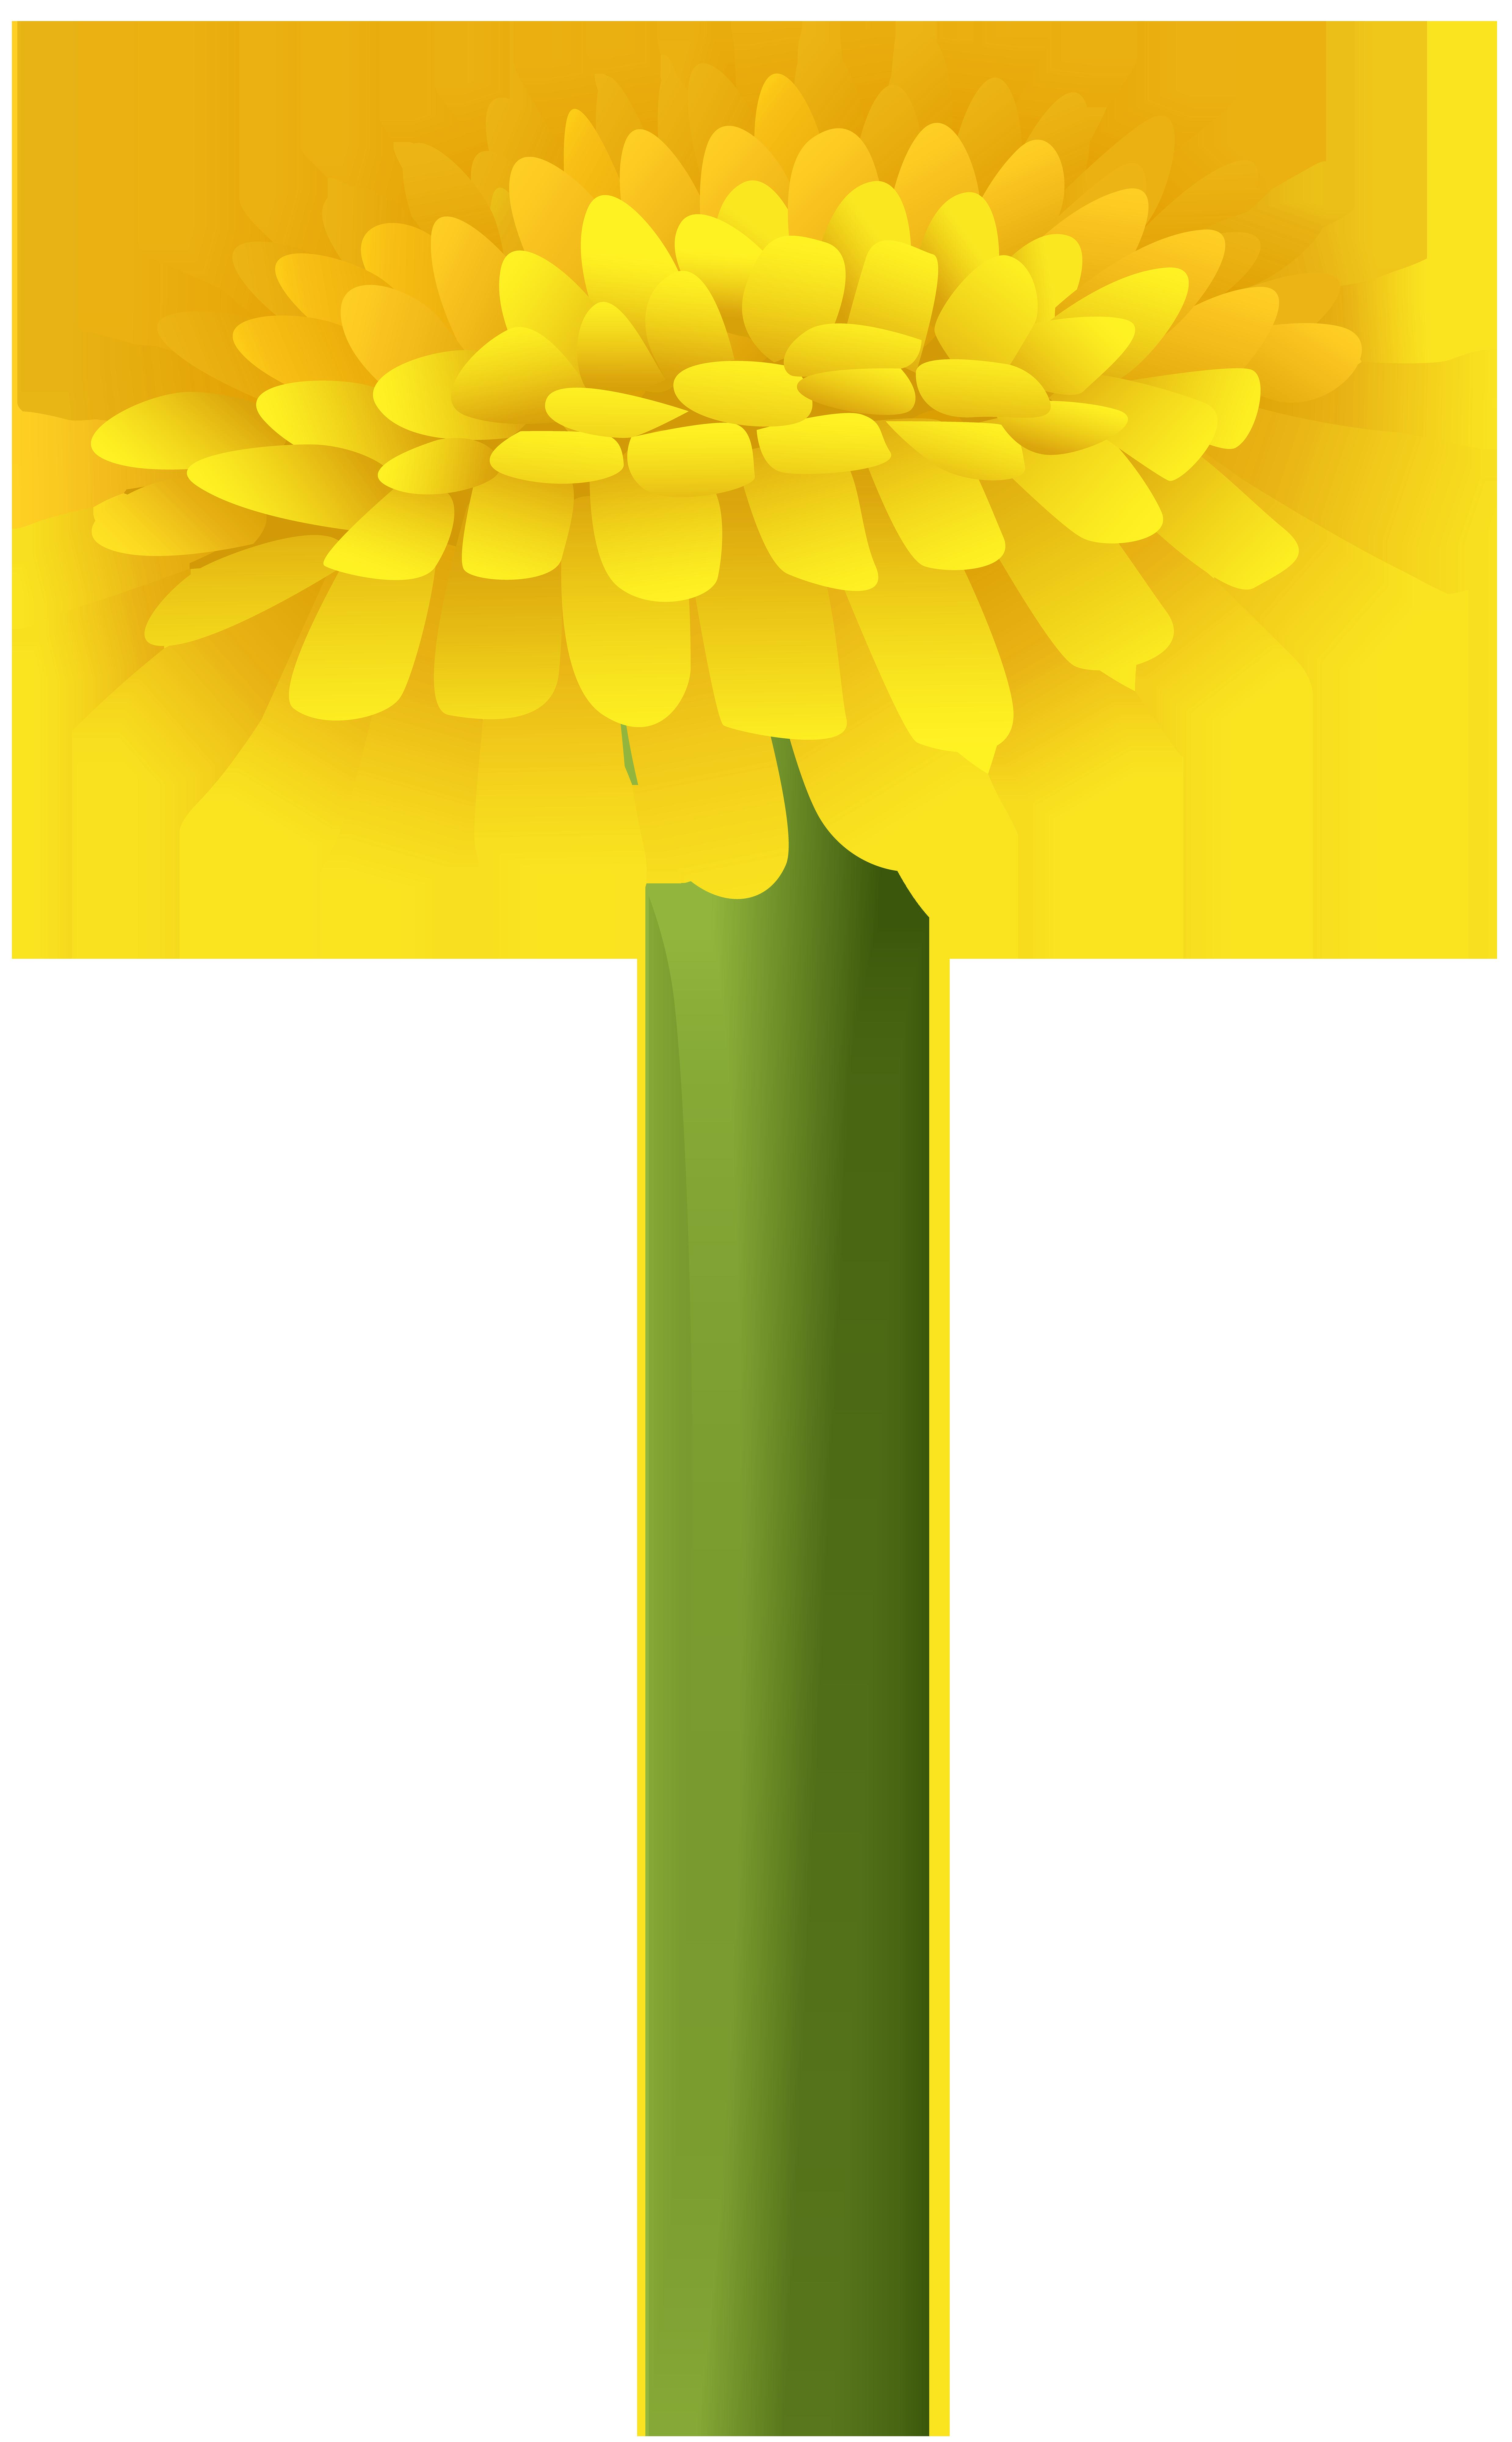 Marigold flower clipart clip art freeuse stock Dandelion PNG Clip Art Image | Gallery Yopriceville - High-Quality ... clip art freeuse stock